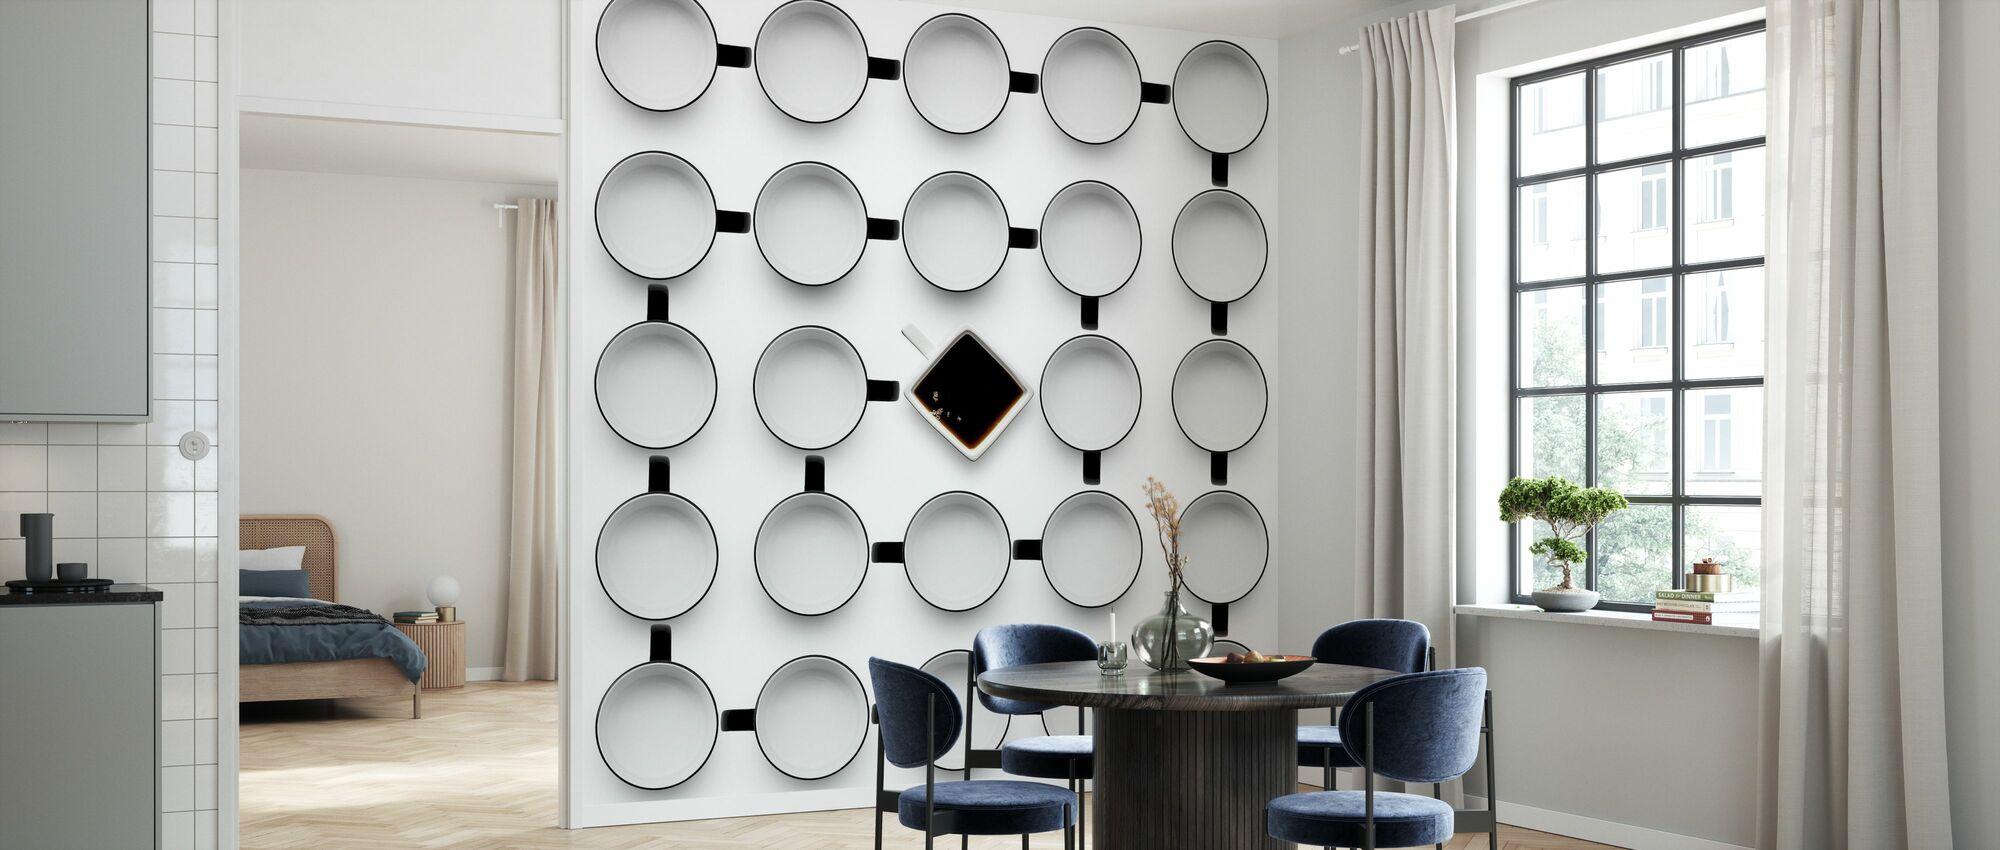 Helix - Wallpaper - Kitchen